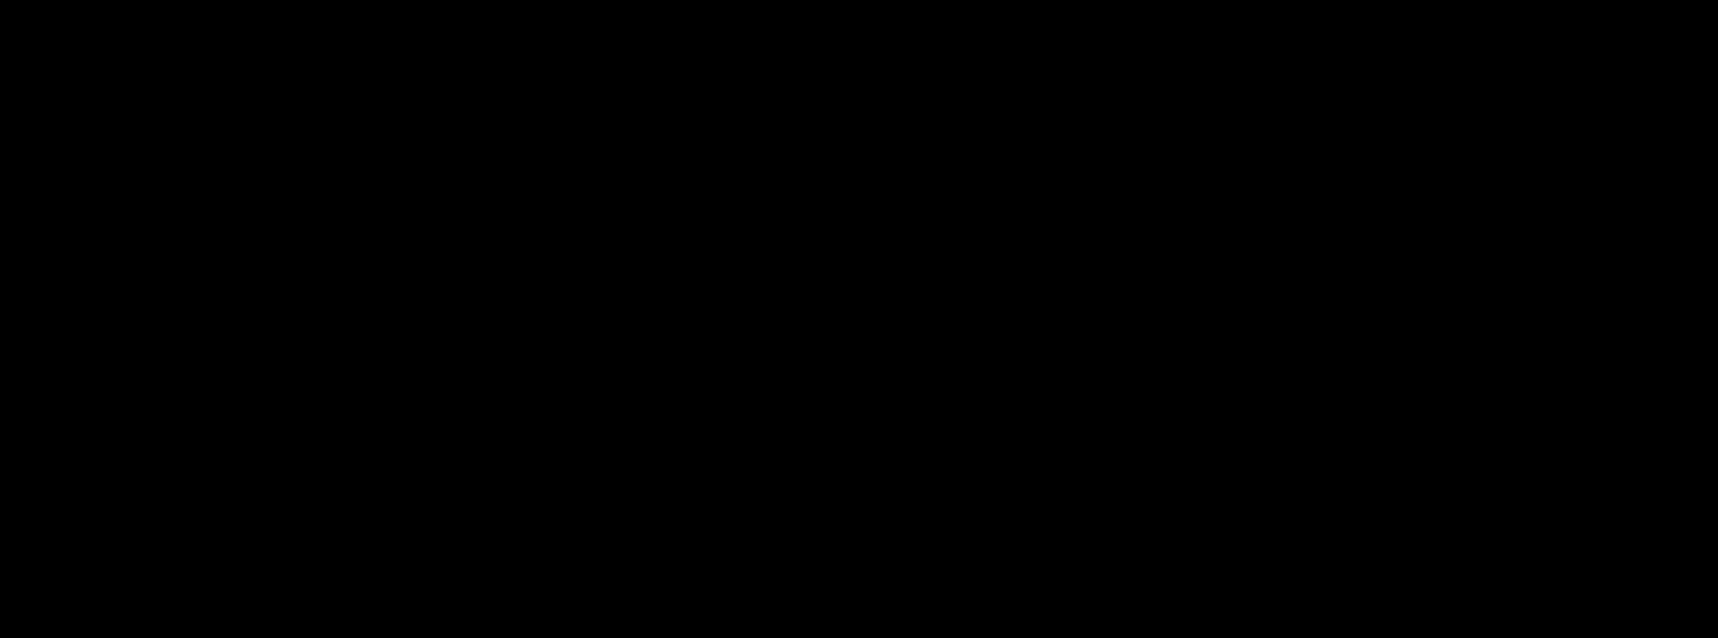 (R)-Amisulpride